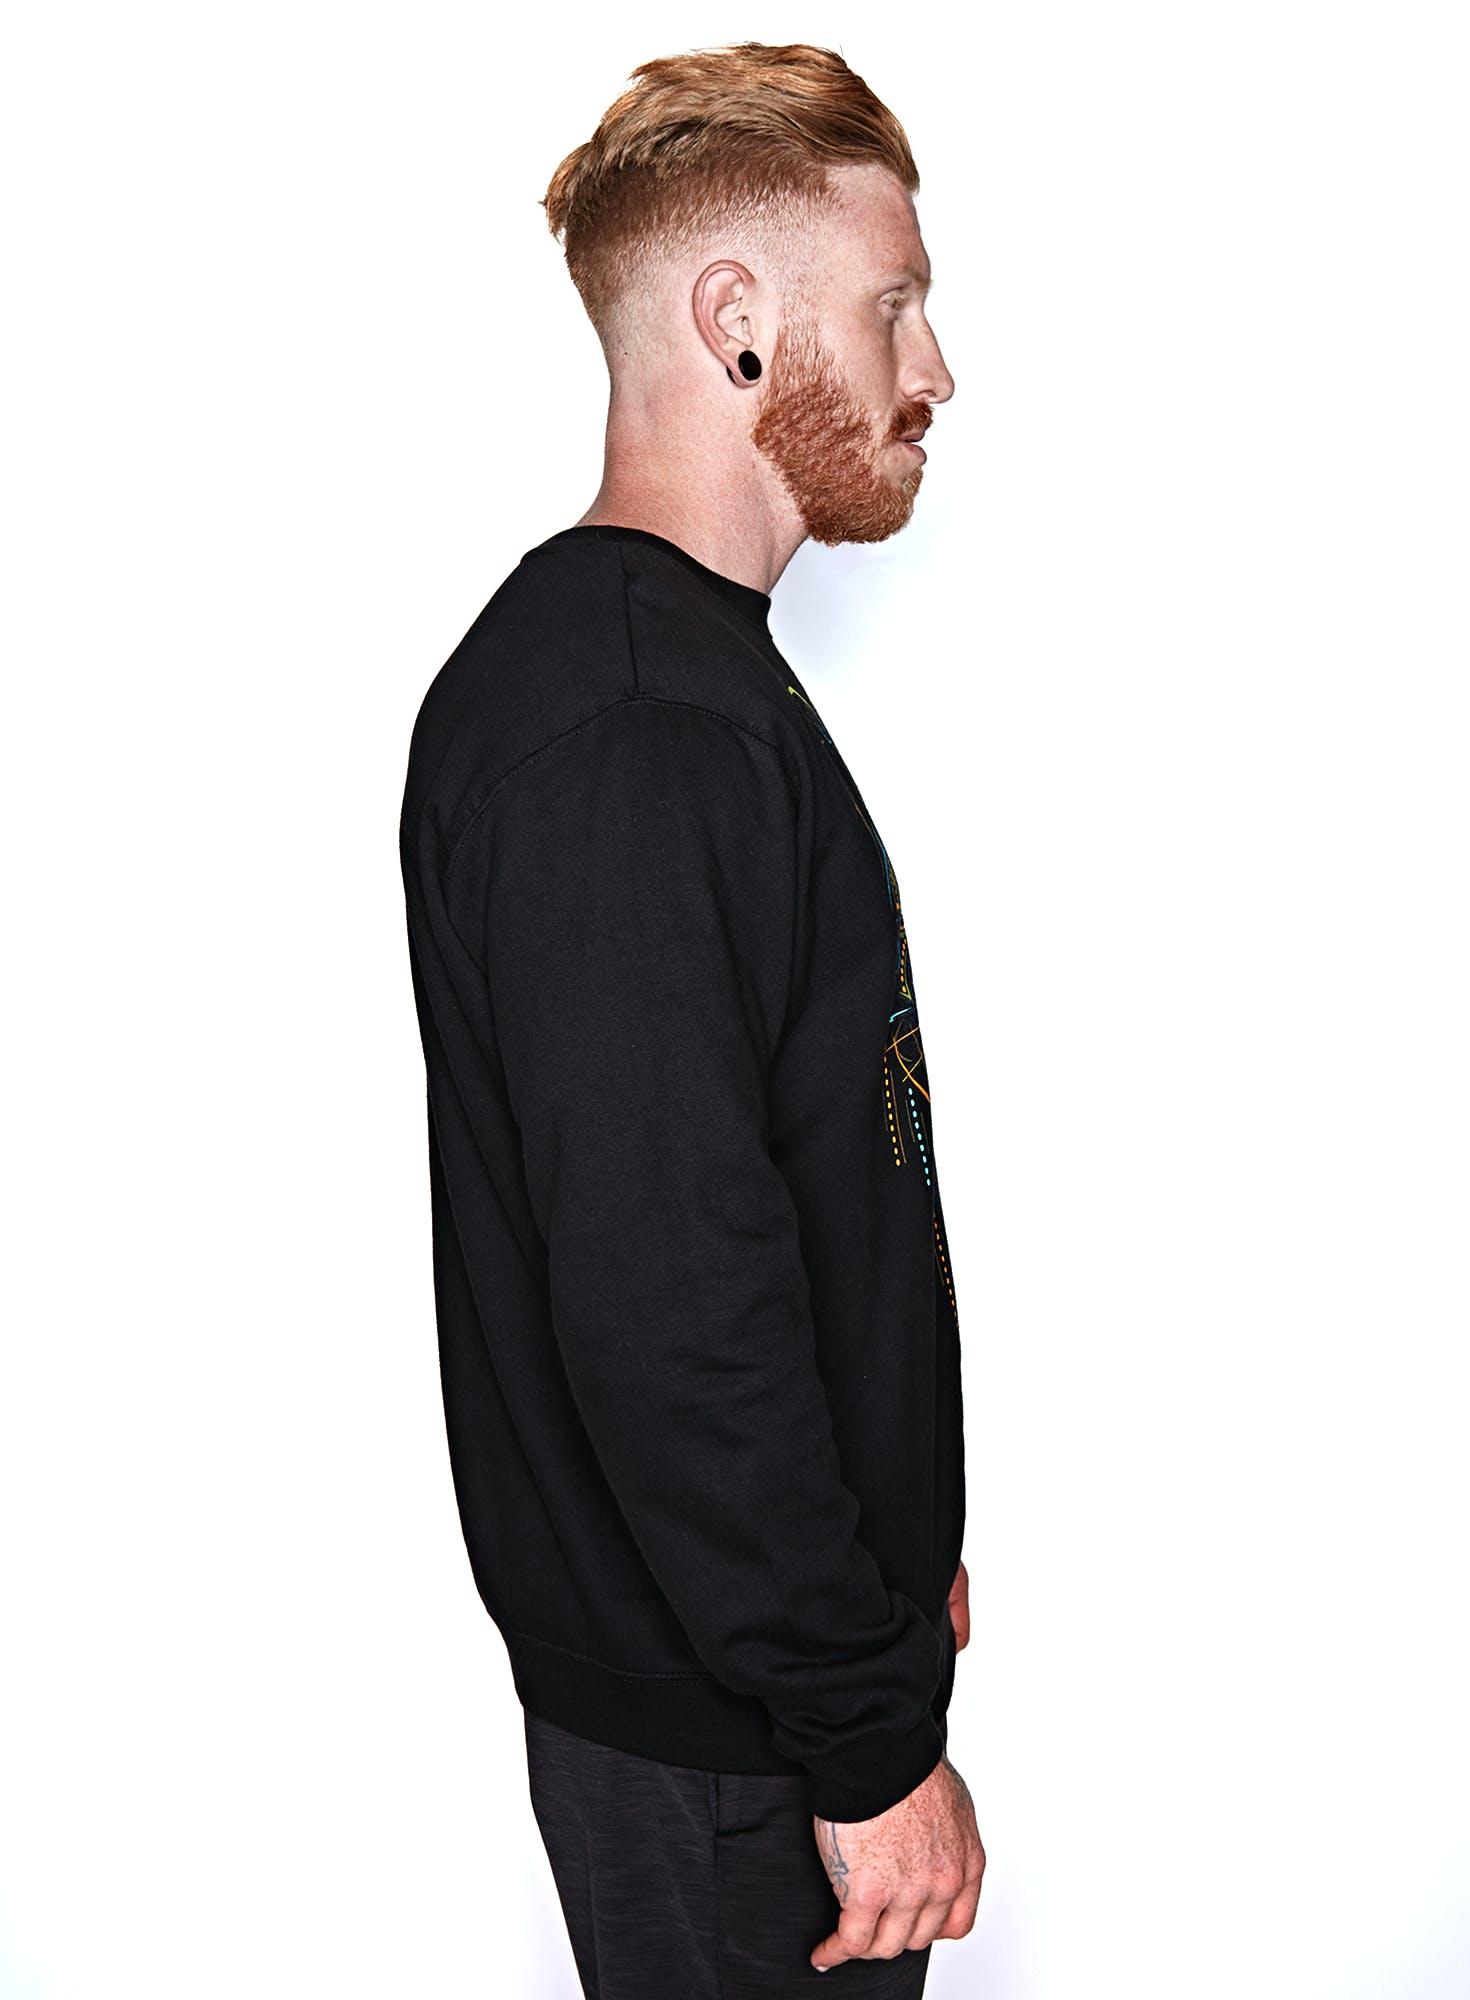 Jaguar Crew Sweatshirt Bonus Image